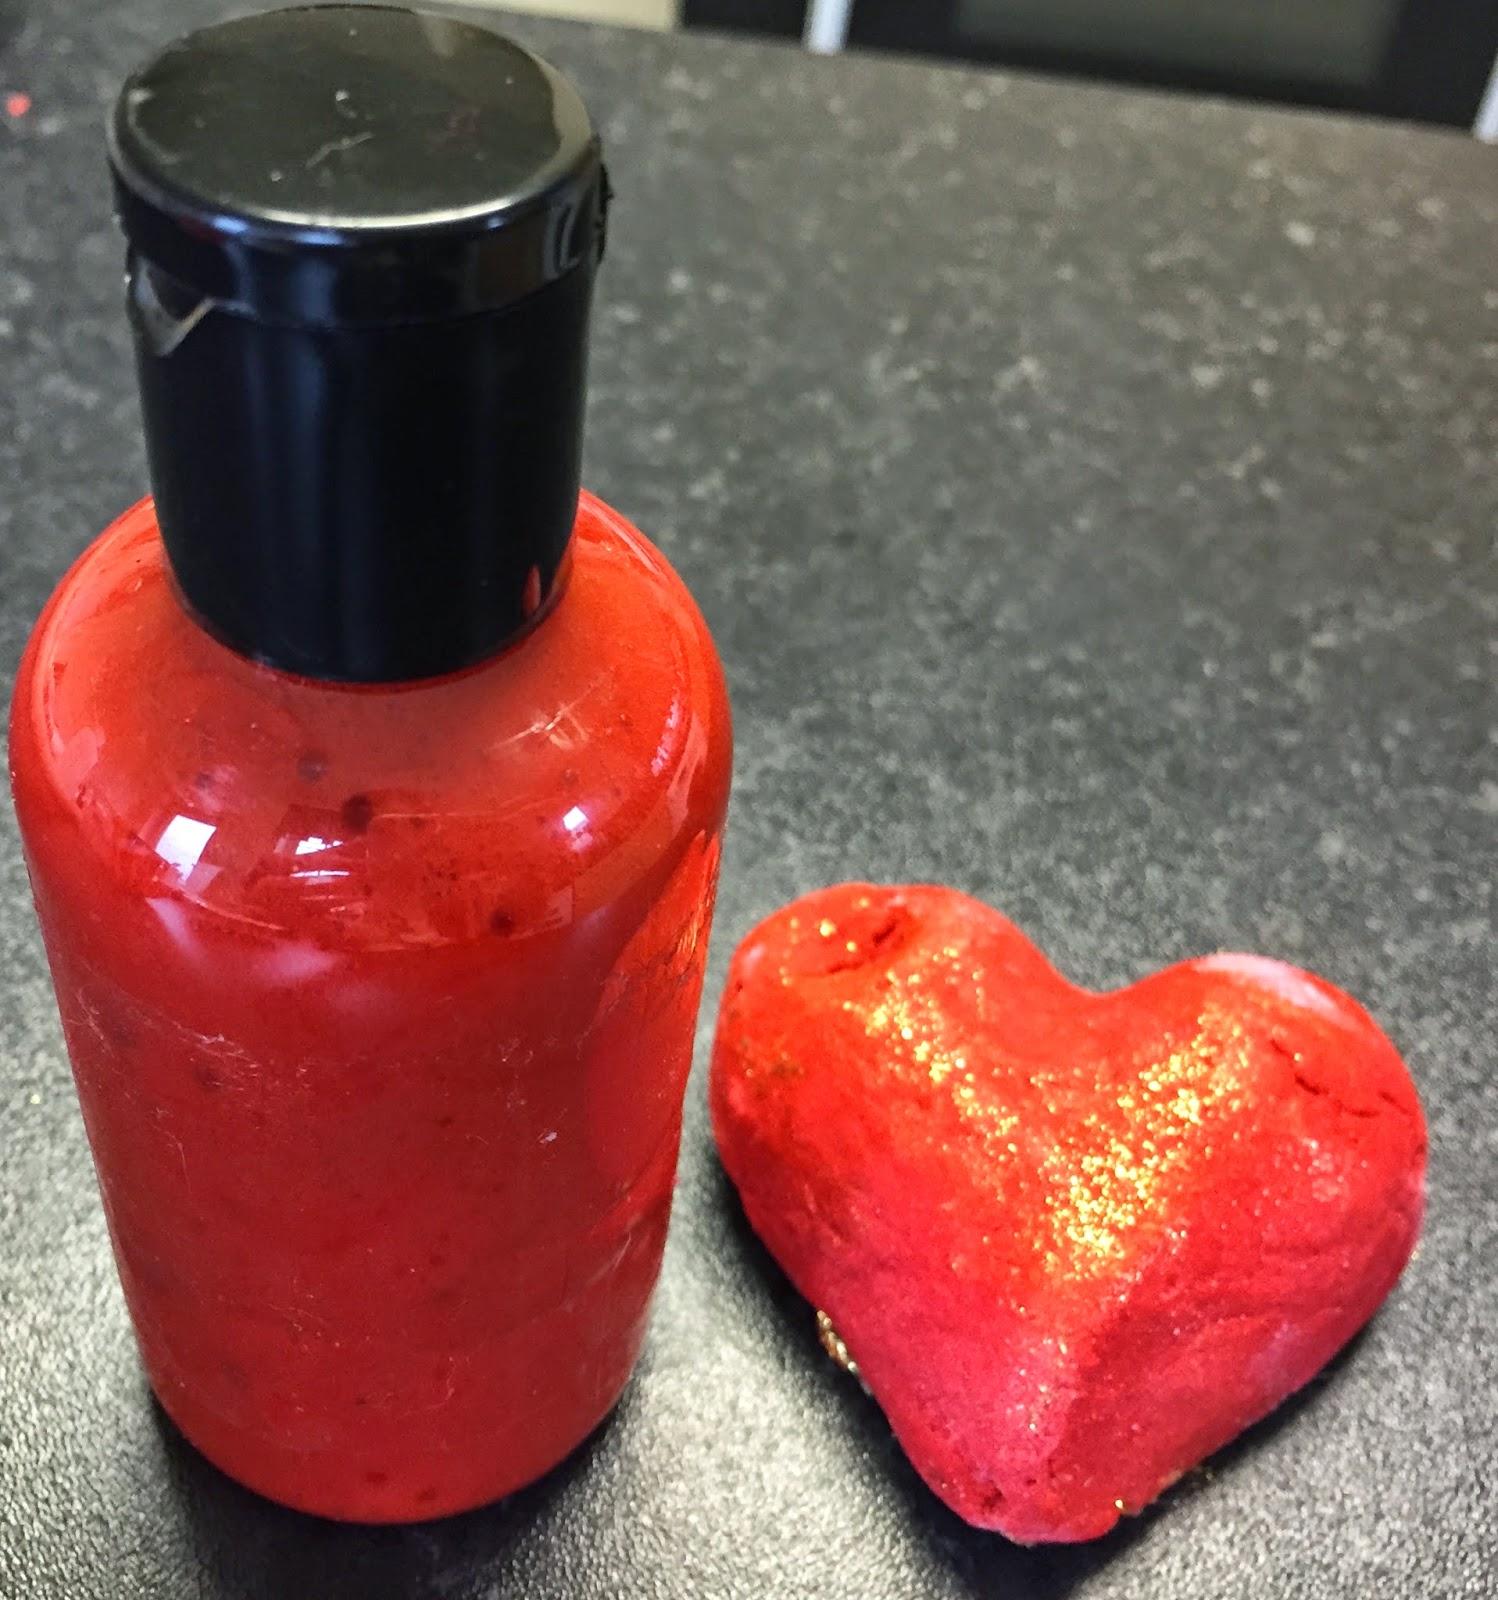 All Things Lush UK: Lush DIY: Heart Throb Shower Gel